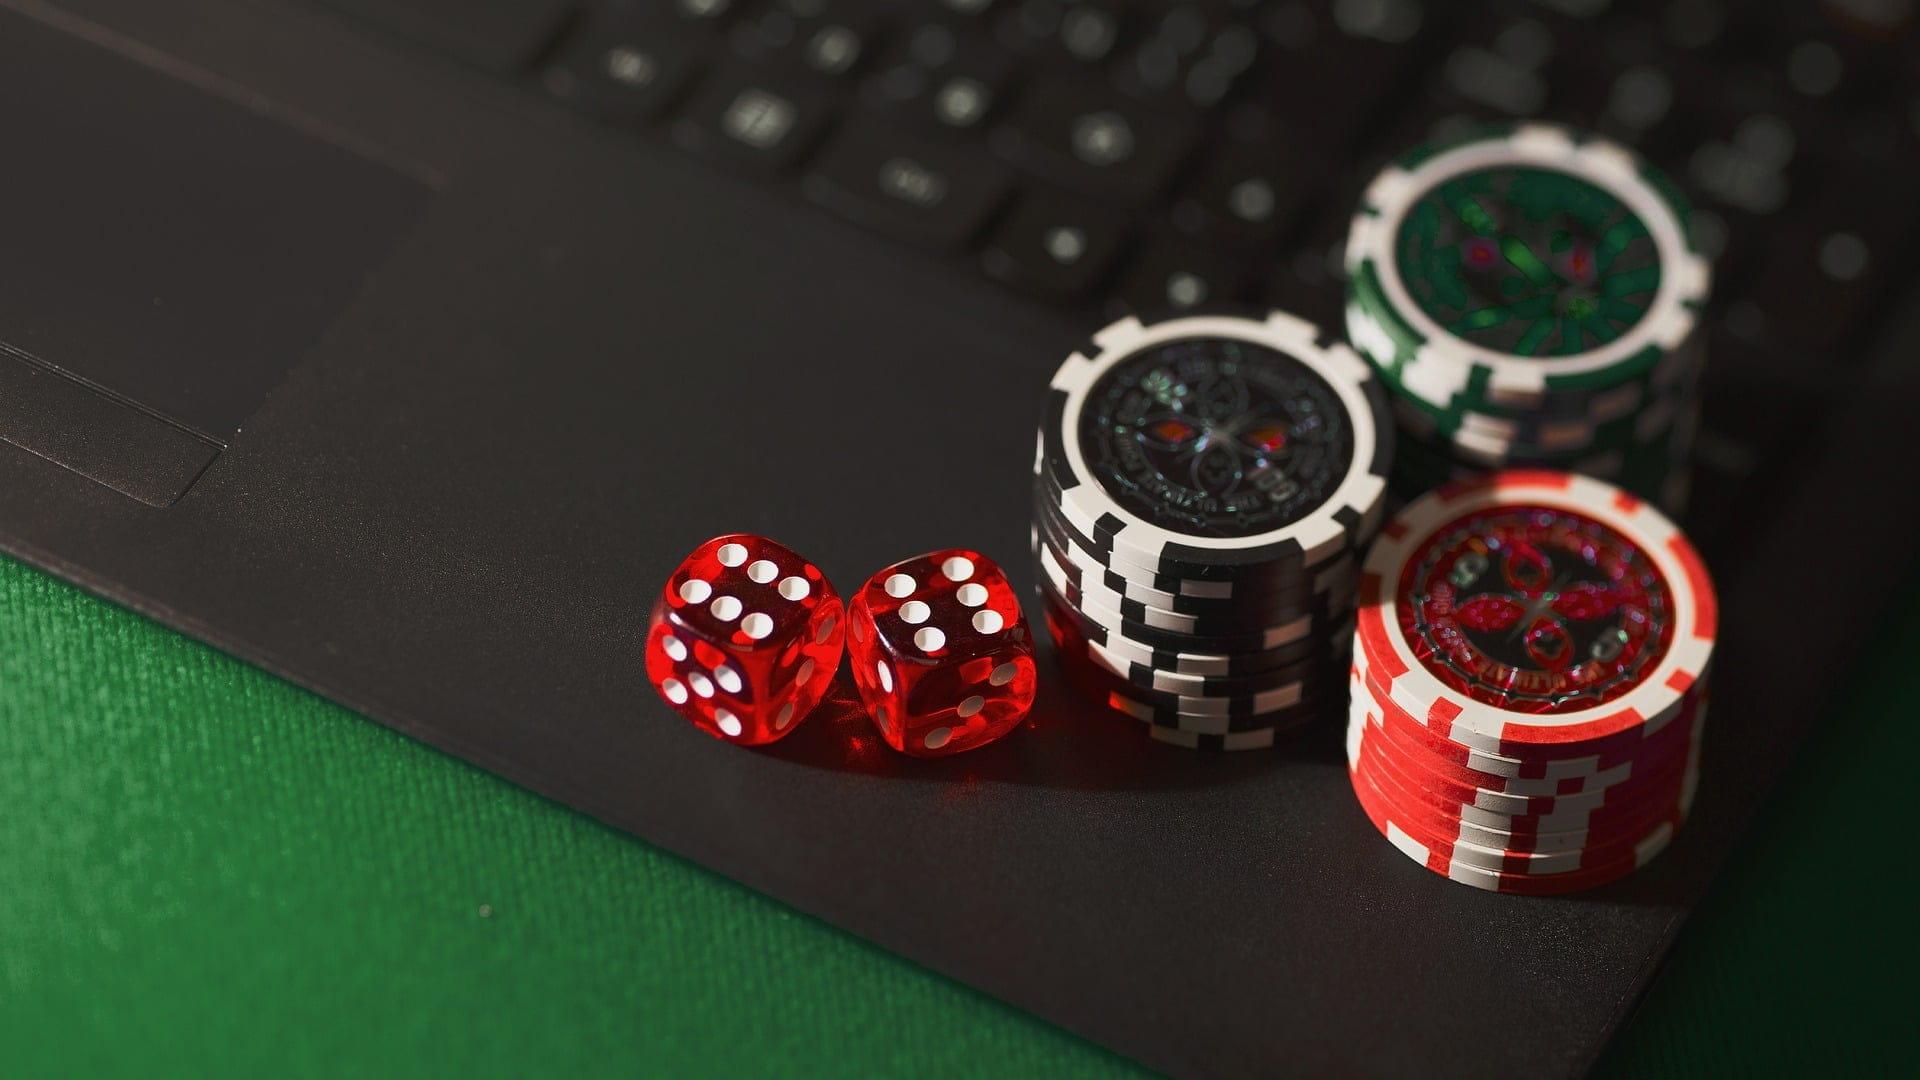 Sands ins digitale Glücksspiel?